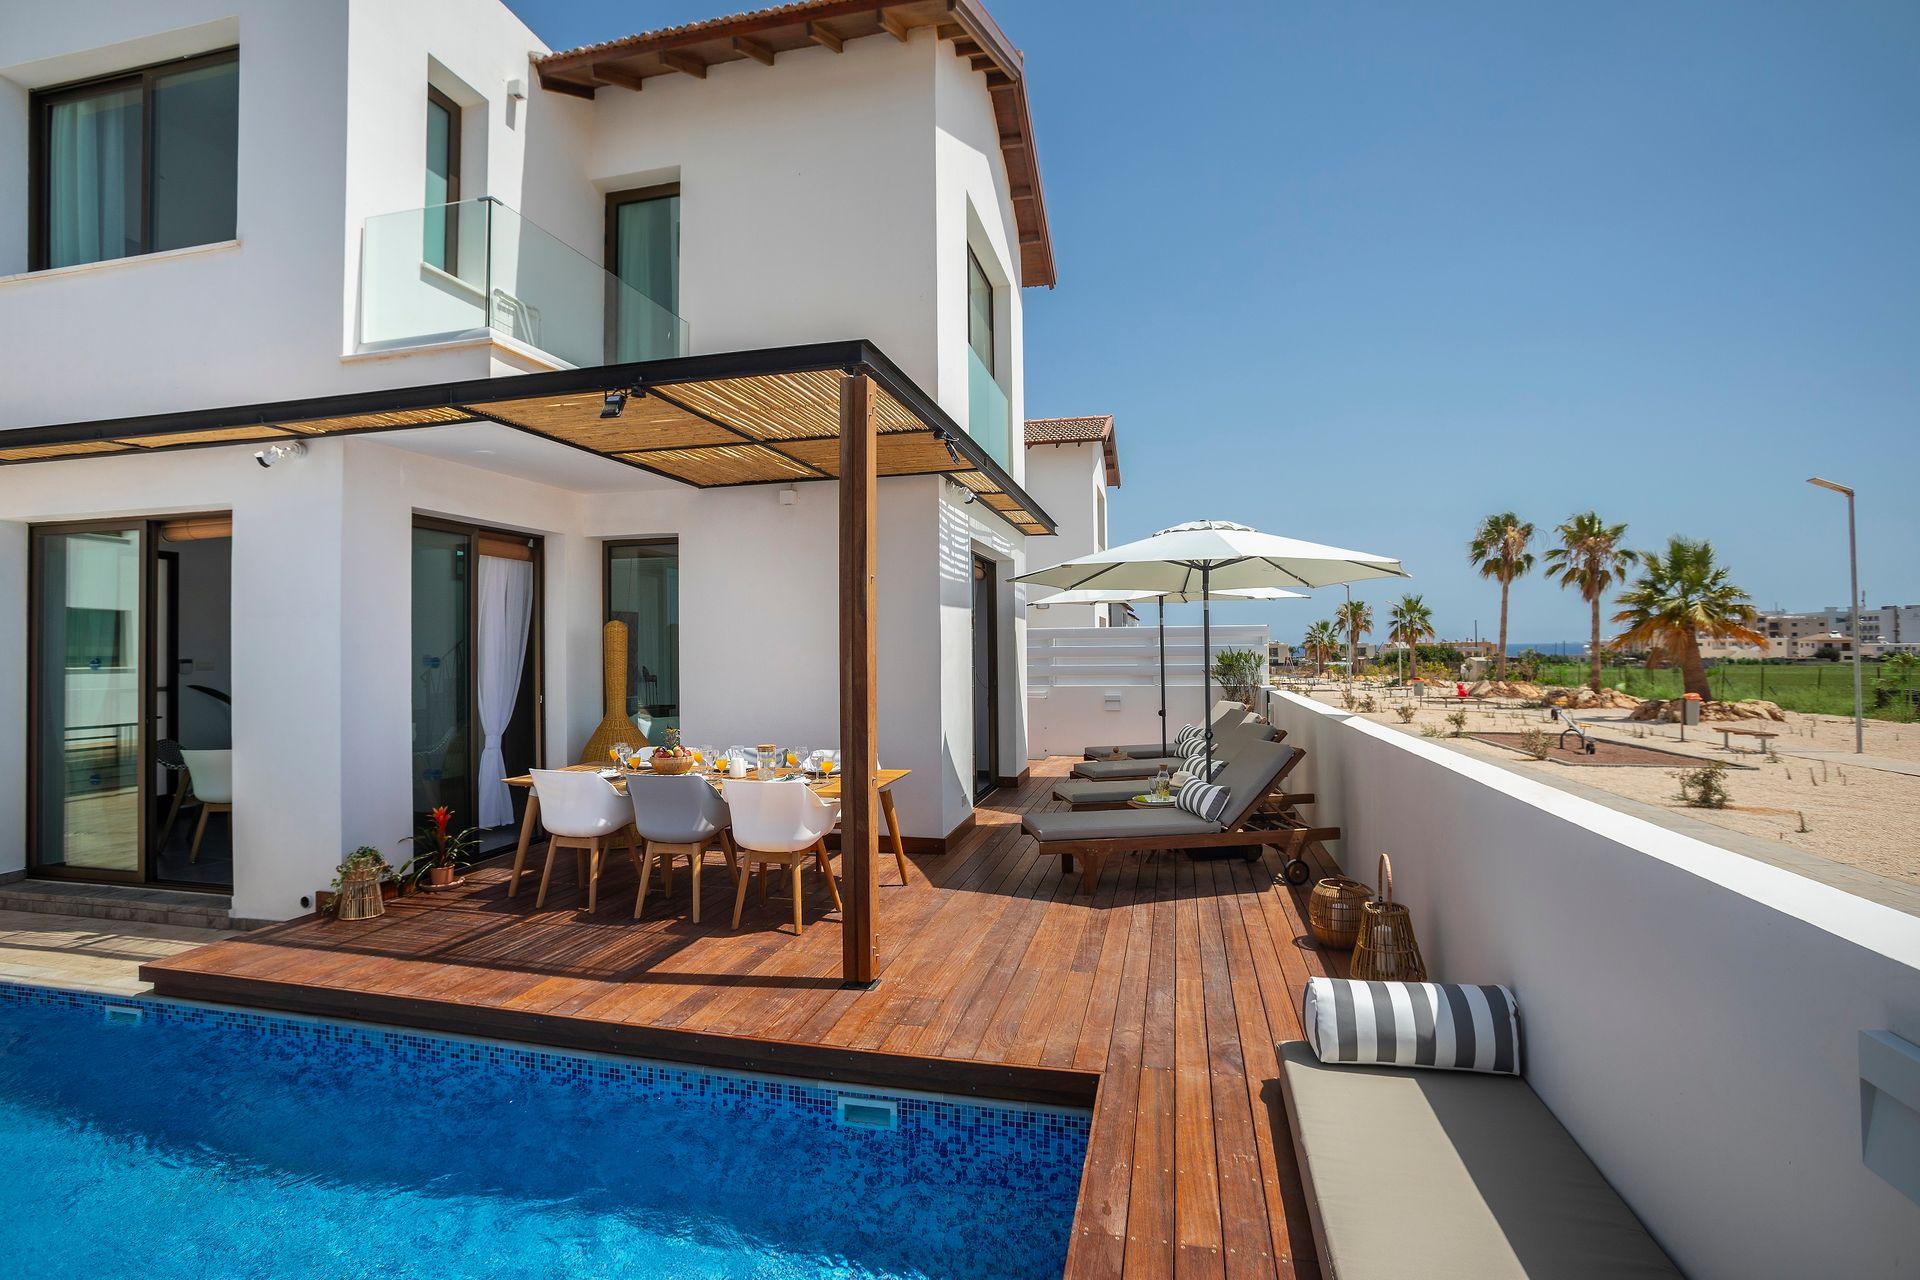 Louis Chris Le Mare Villa Protaras - Κύπρος ✦ 6 Ημέρες (5 Διανυκτερεύσεις) ✦ 6 άτομα ✦ Χωρίς Πρωινό ✦ 01/06/2021 έως 30/09/2021 ✦ Υπέροχη Τοποθεσία!